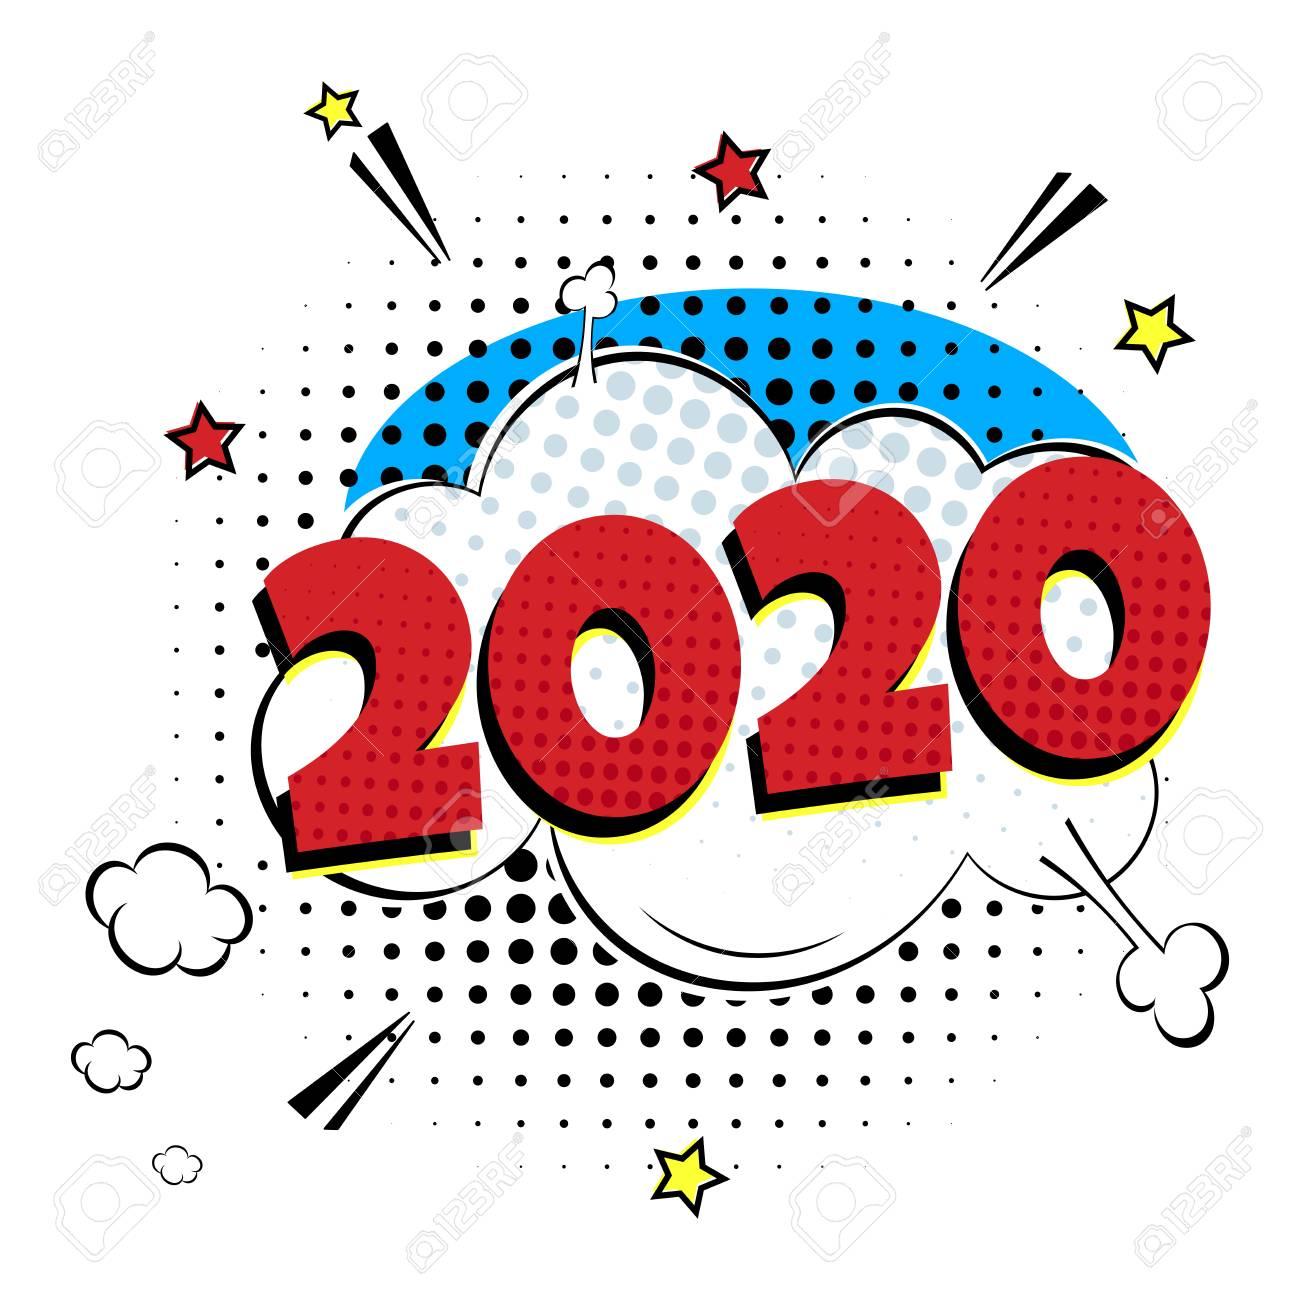 Christmas Comic 2020 2020 Happy New Year Christmas Comic Pop Art Speech Bubble Vector